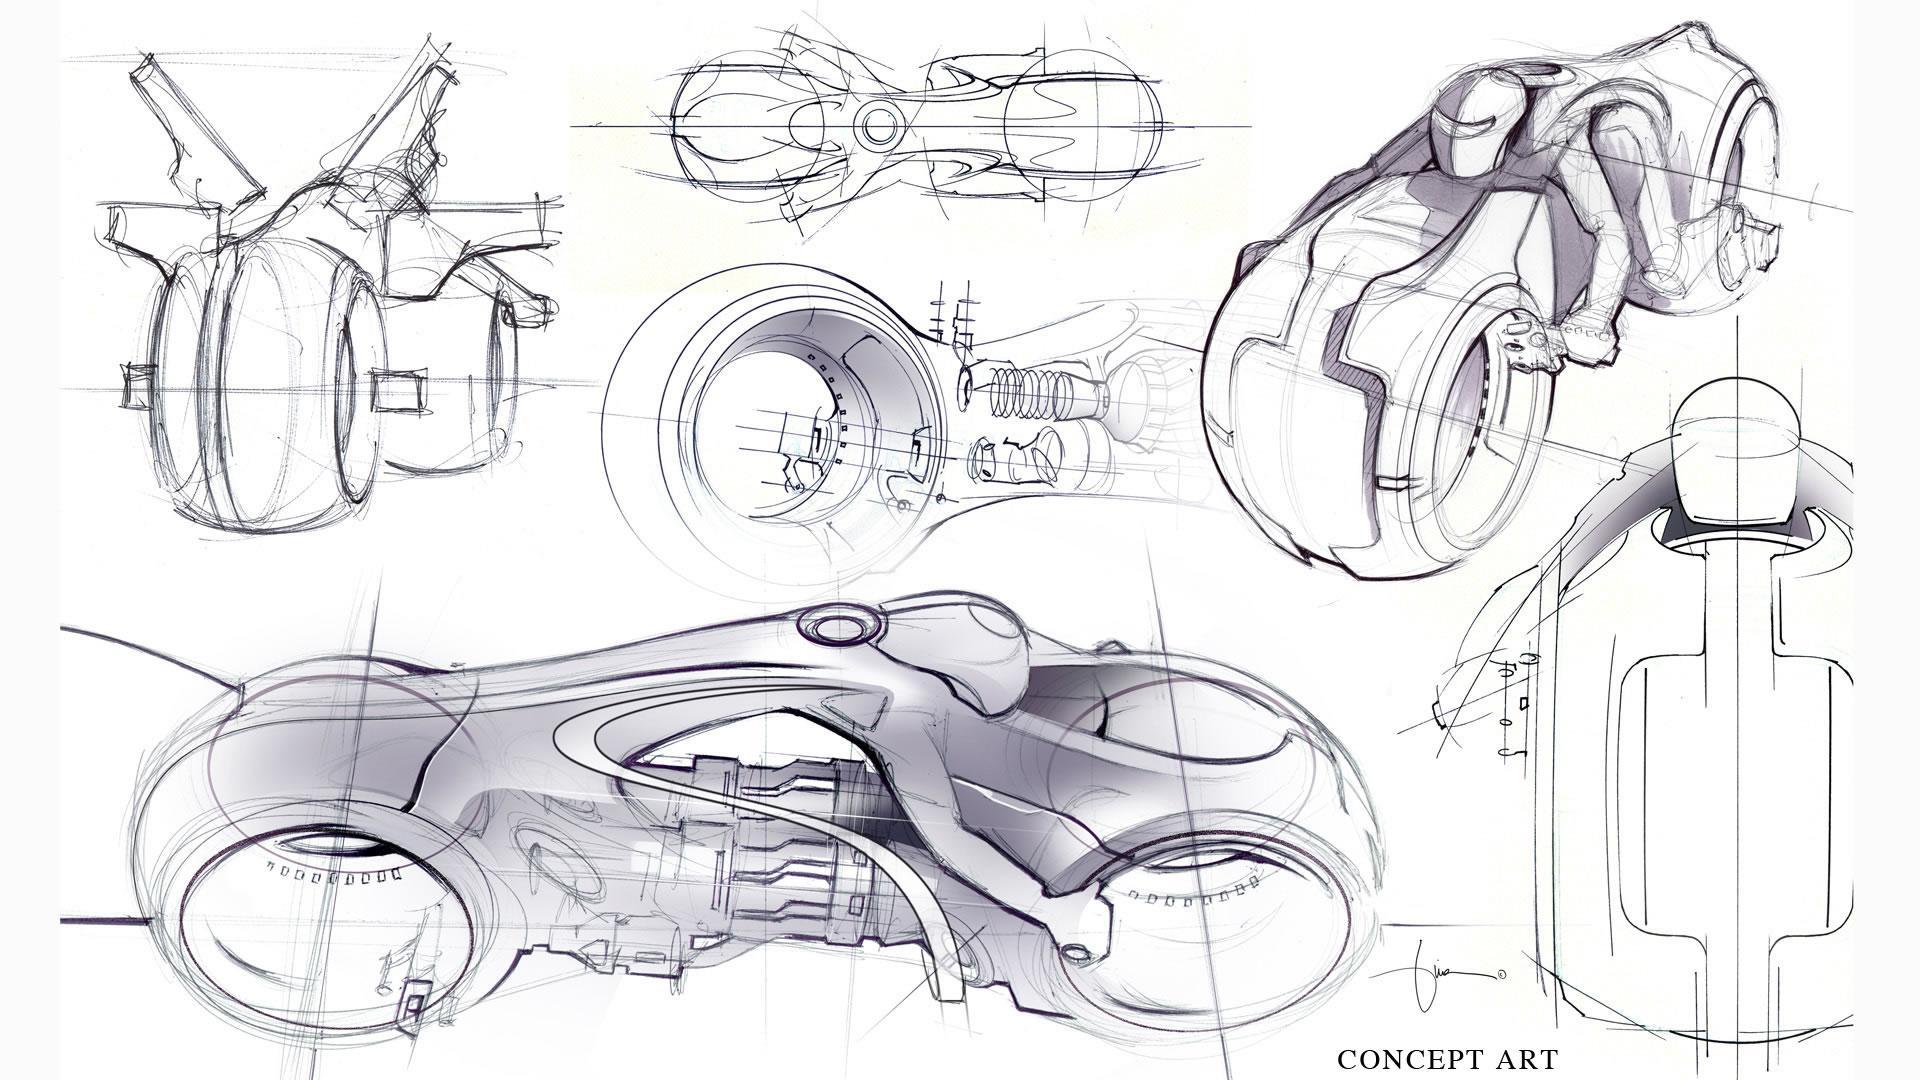 concept-artwork-Tron-Legacy-8.jpg (1920×1080)